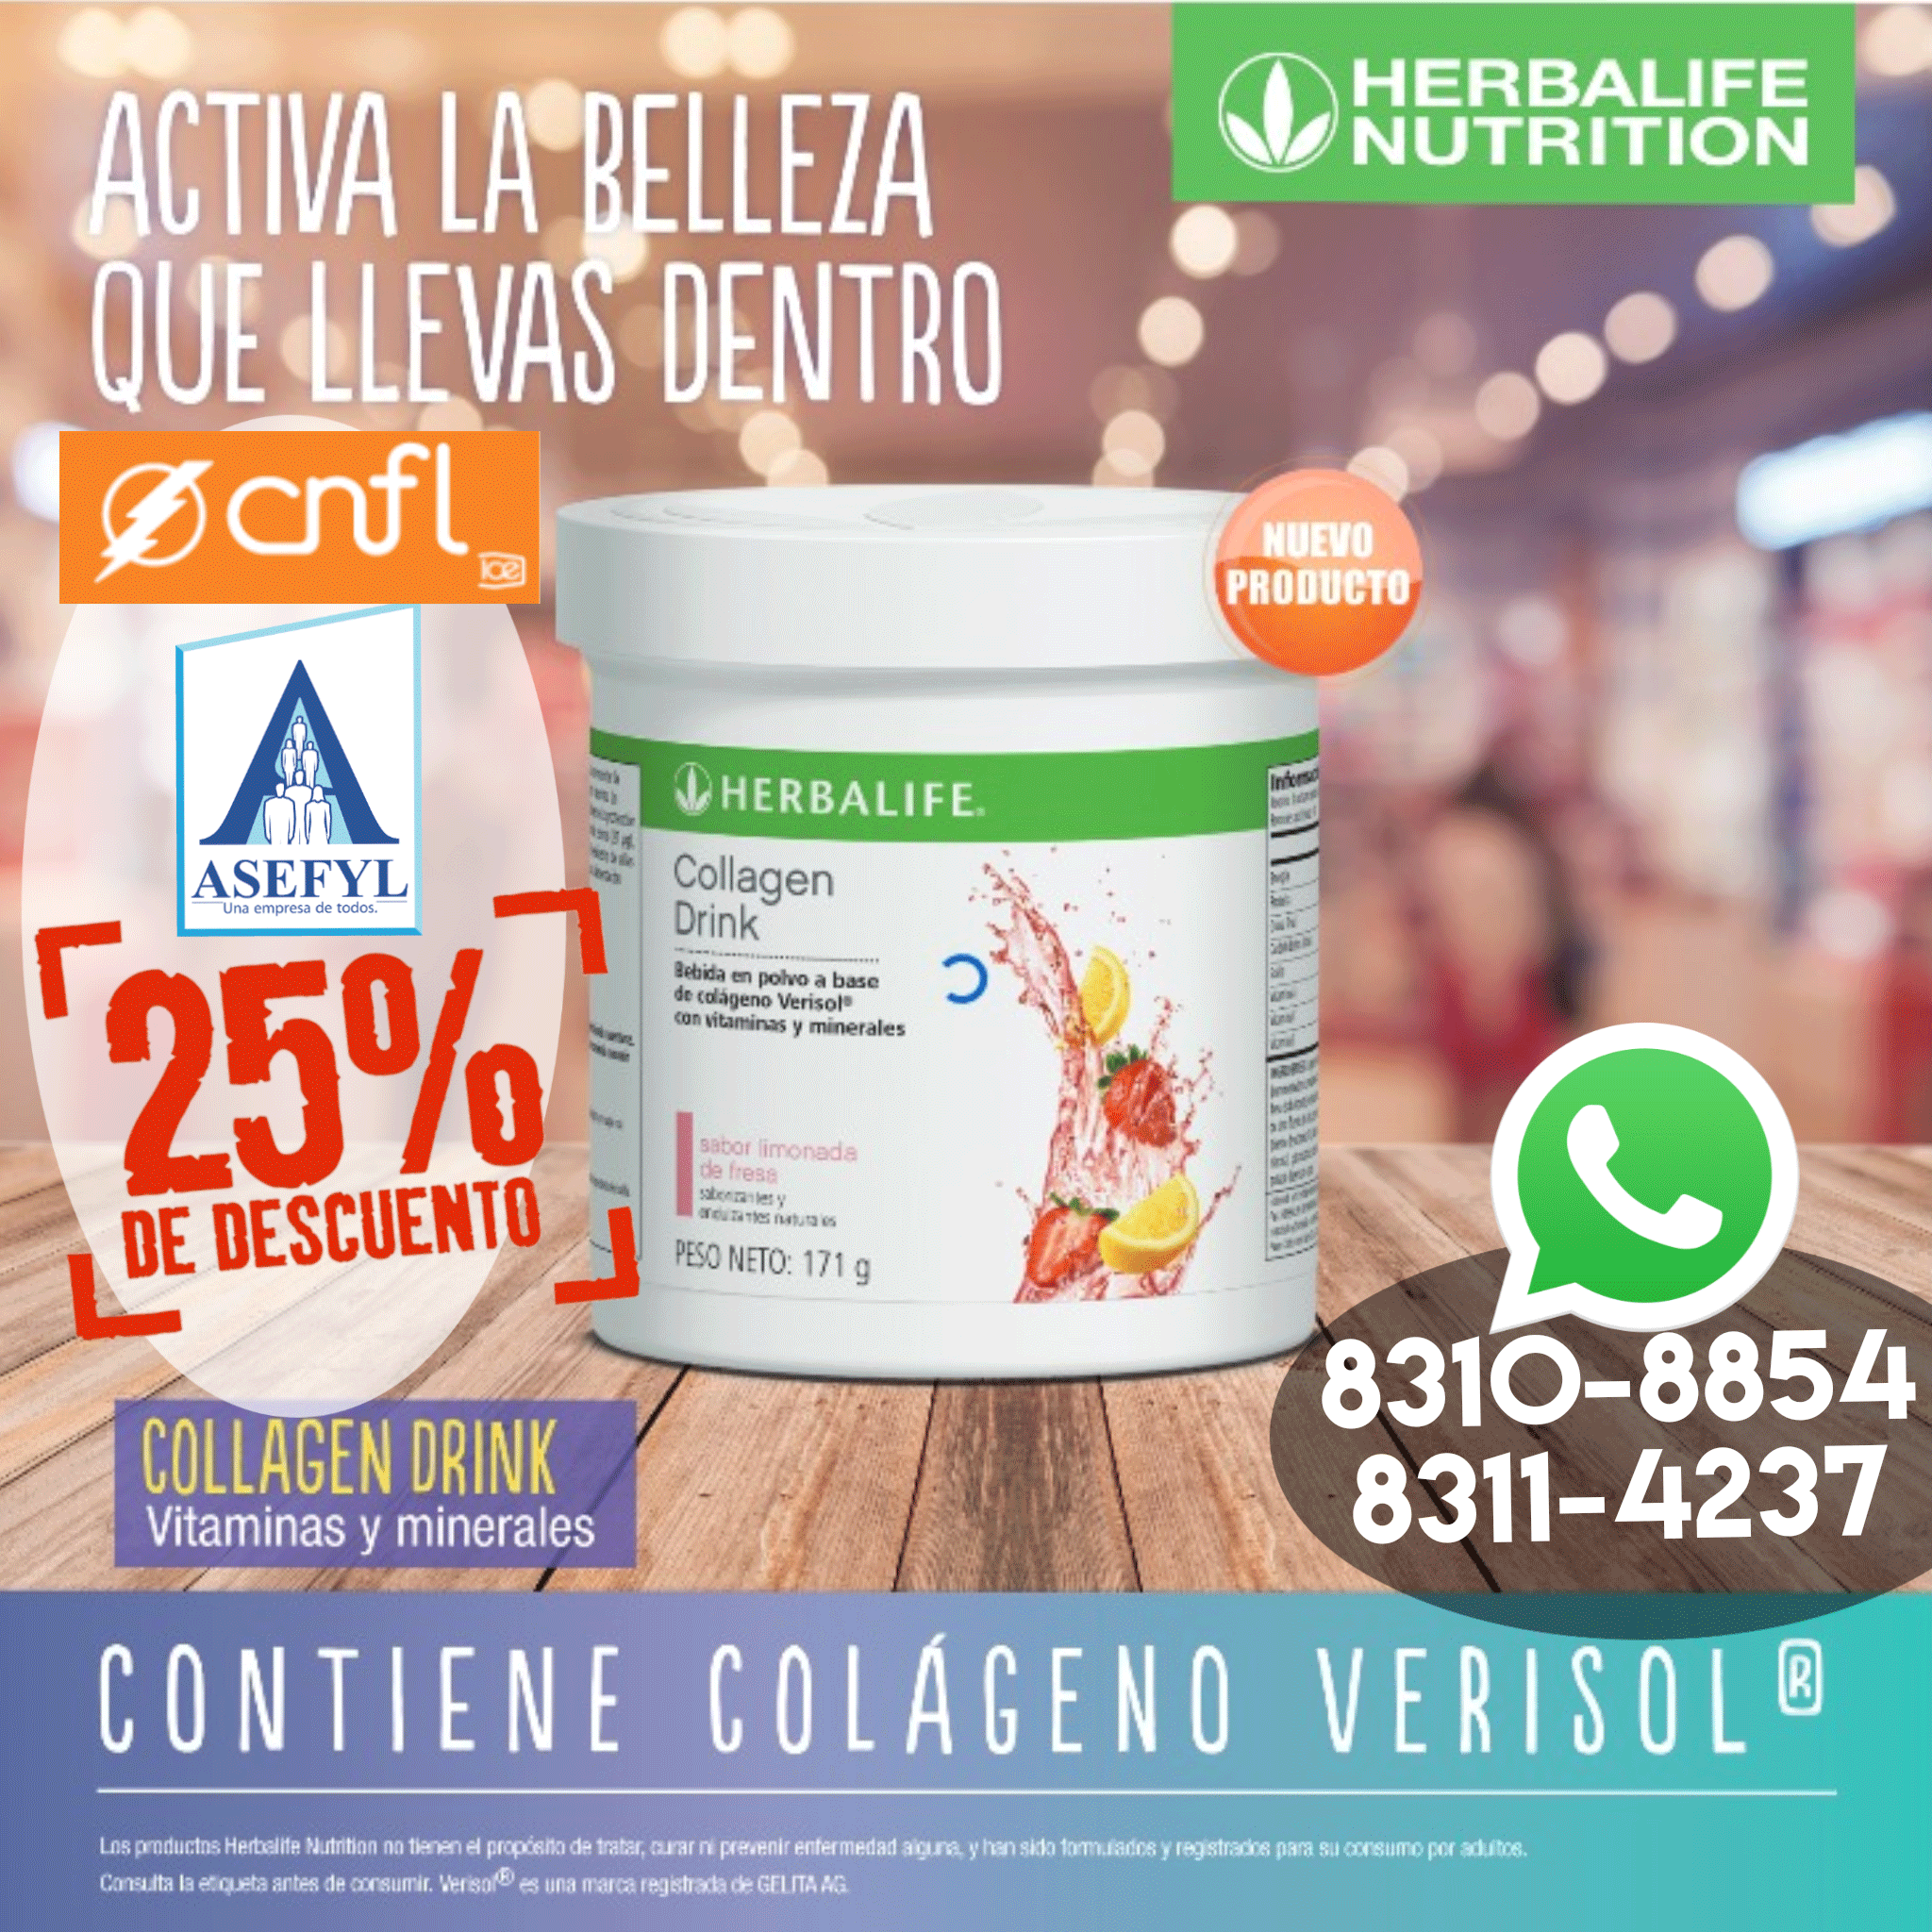 Herbalife-Colageno-Verisol